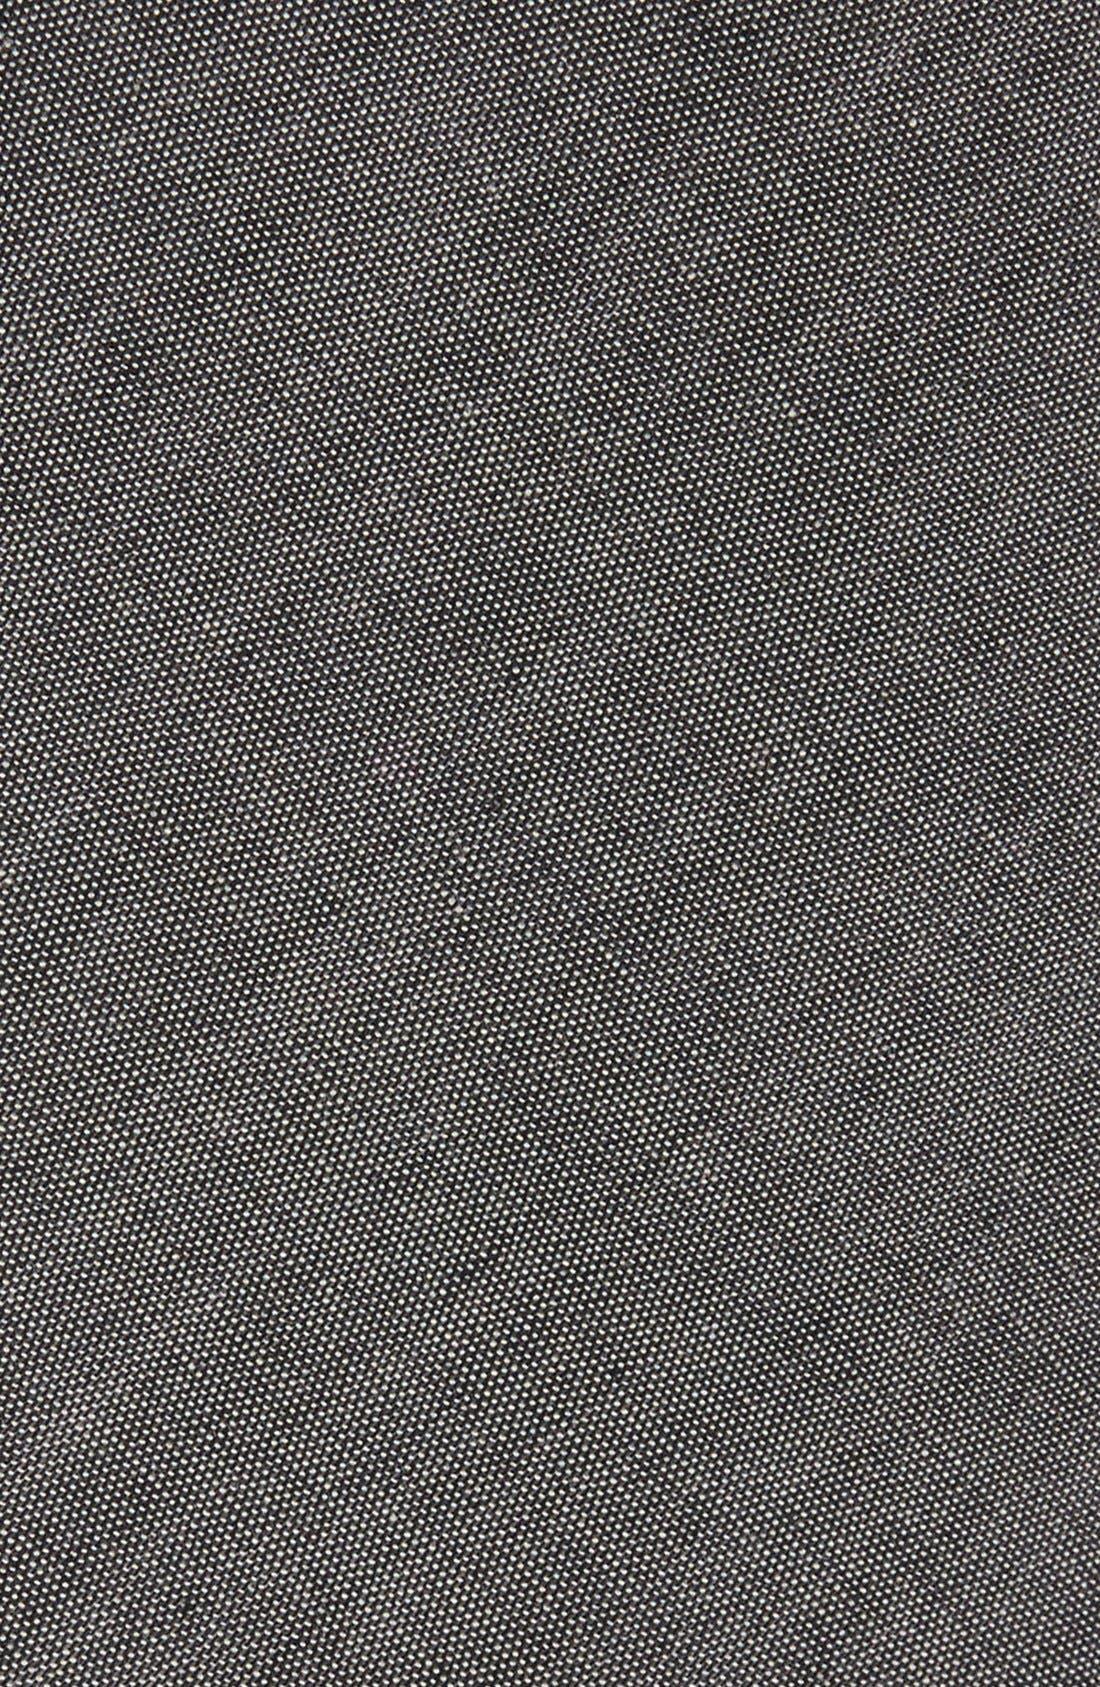 Cotton Tie,                             Alternate thumbnail 2, color,                             WARM GREY